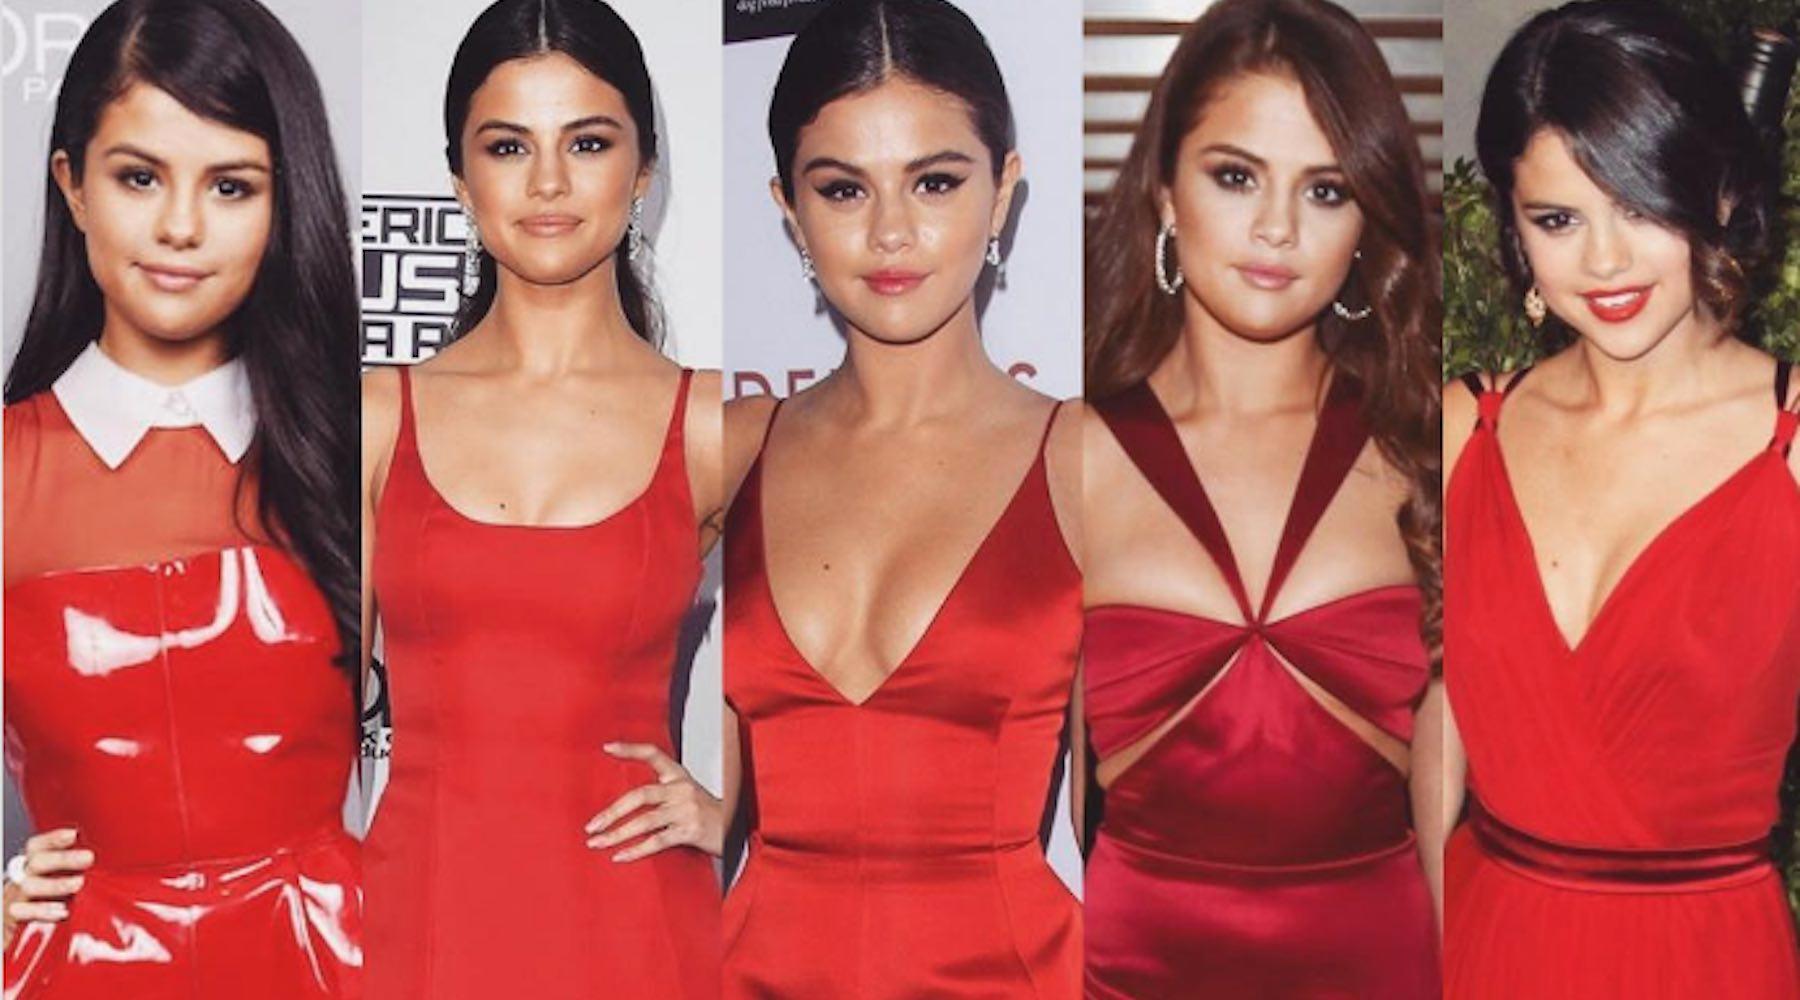 0bf0df53 Steffano Gabbana Calls Selena Gomez Ugly — IG Explodes